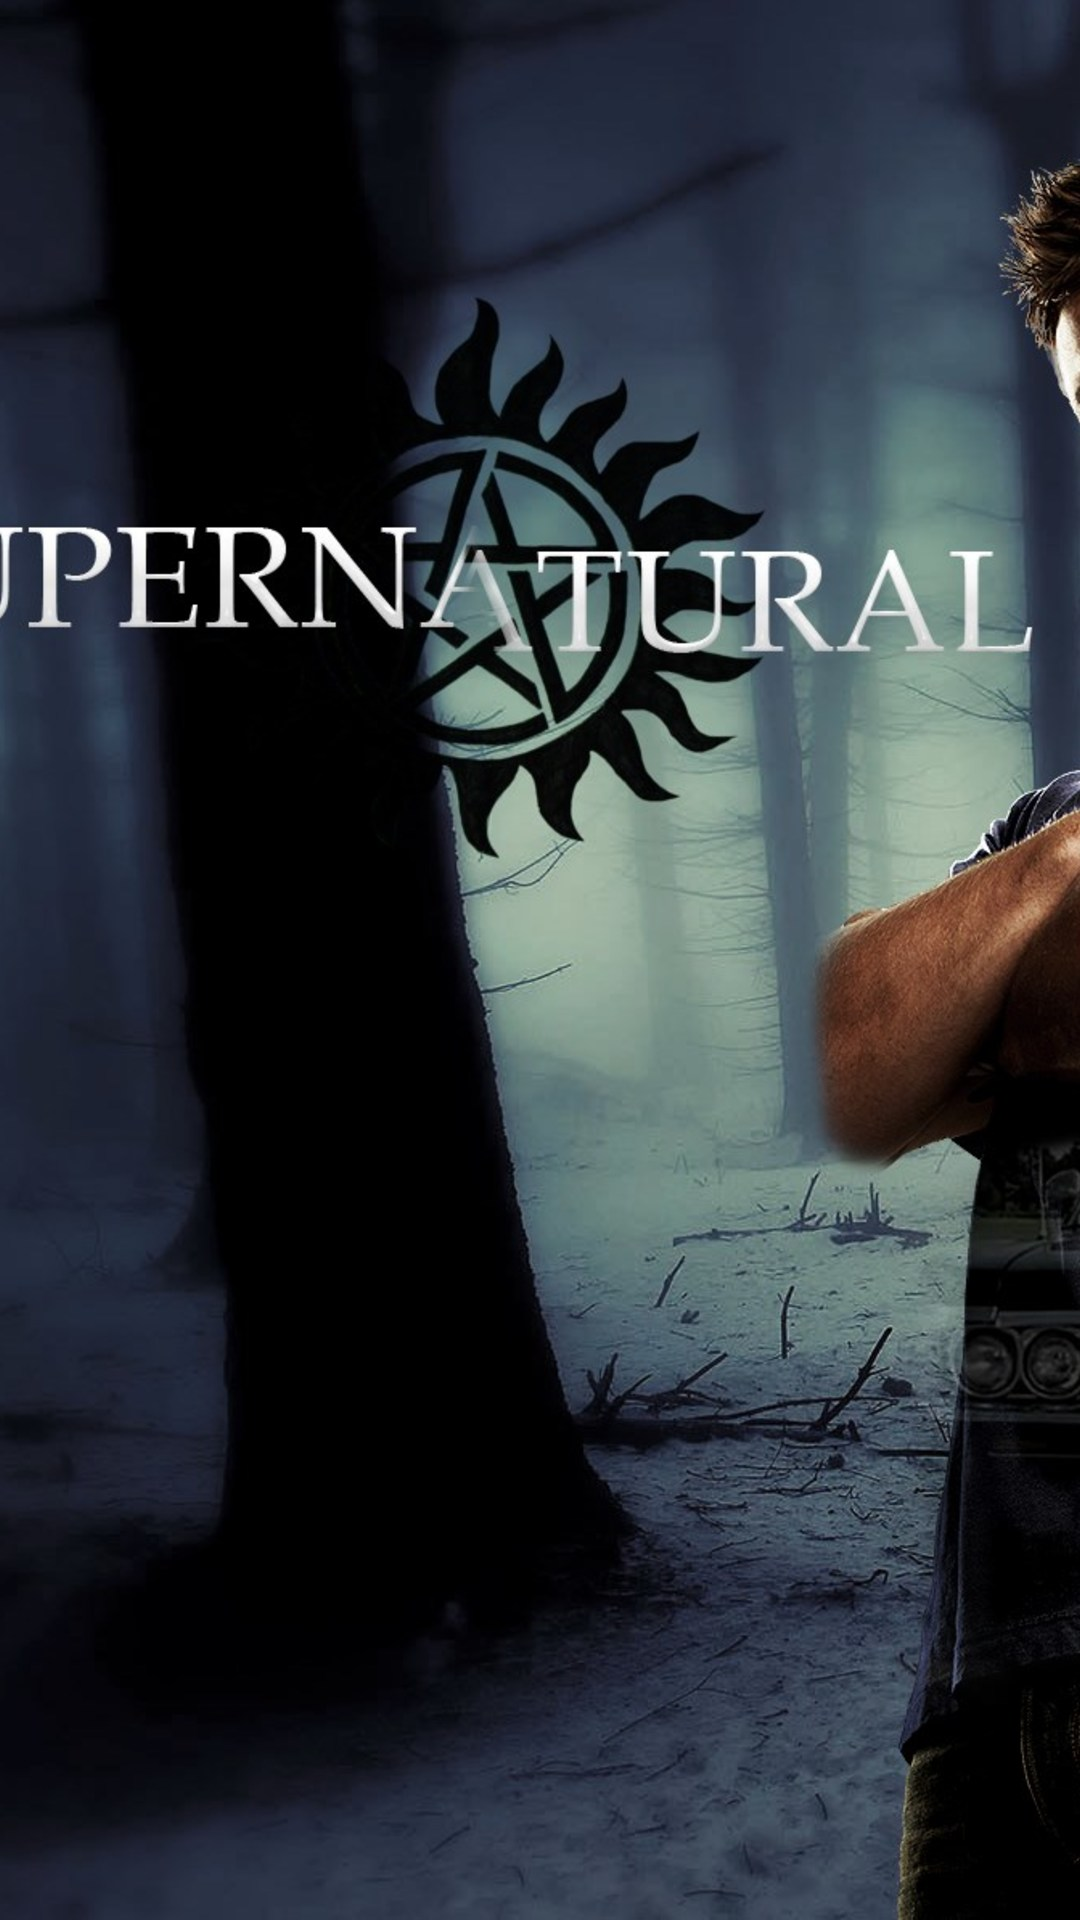 Supernatural Tv Iphone 7 6s 6 Plus Pixel Xl One - Supernatural Anti Possession Tattoo , HD Wallpaper & Backgrounds